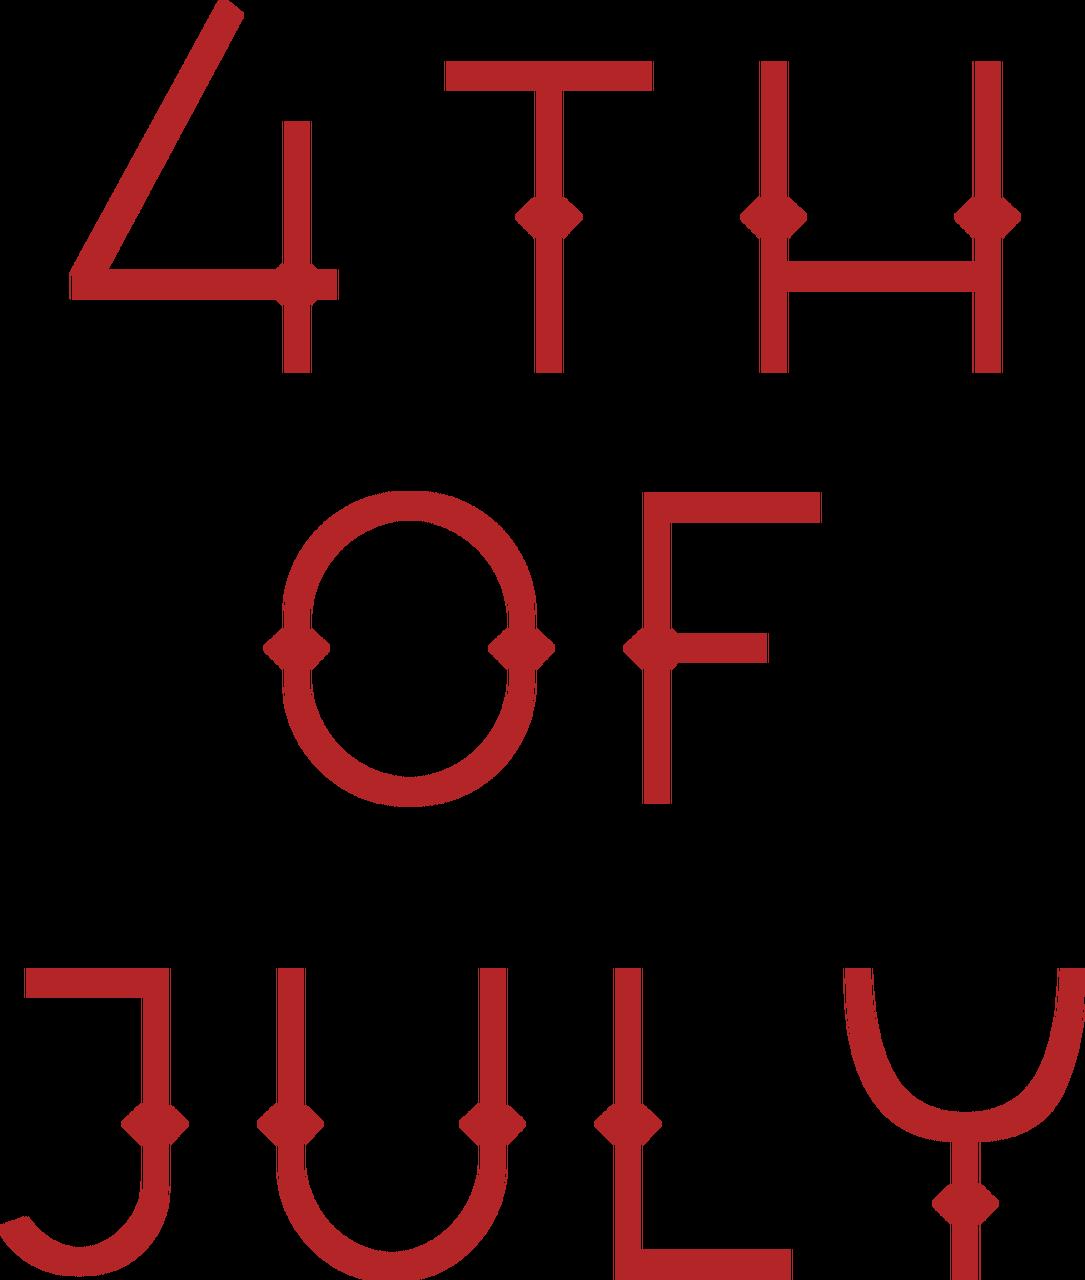 4th Of July #2 SVG Cut File